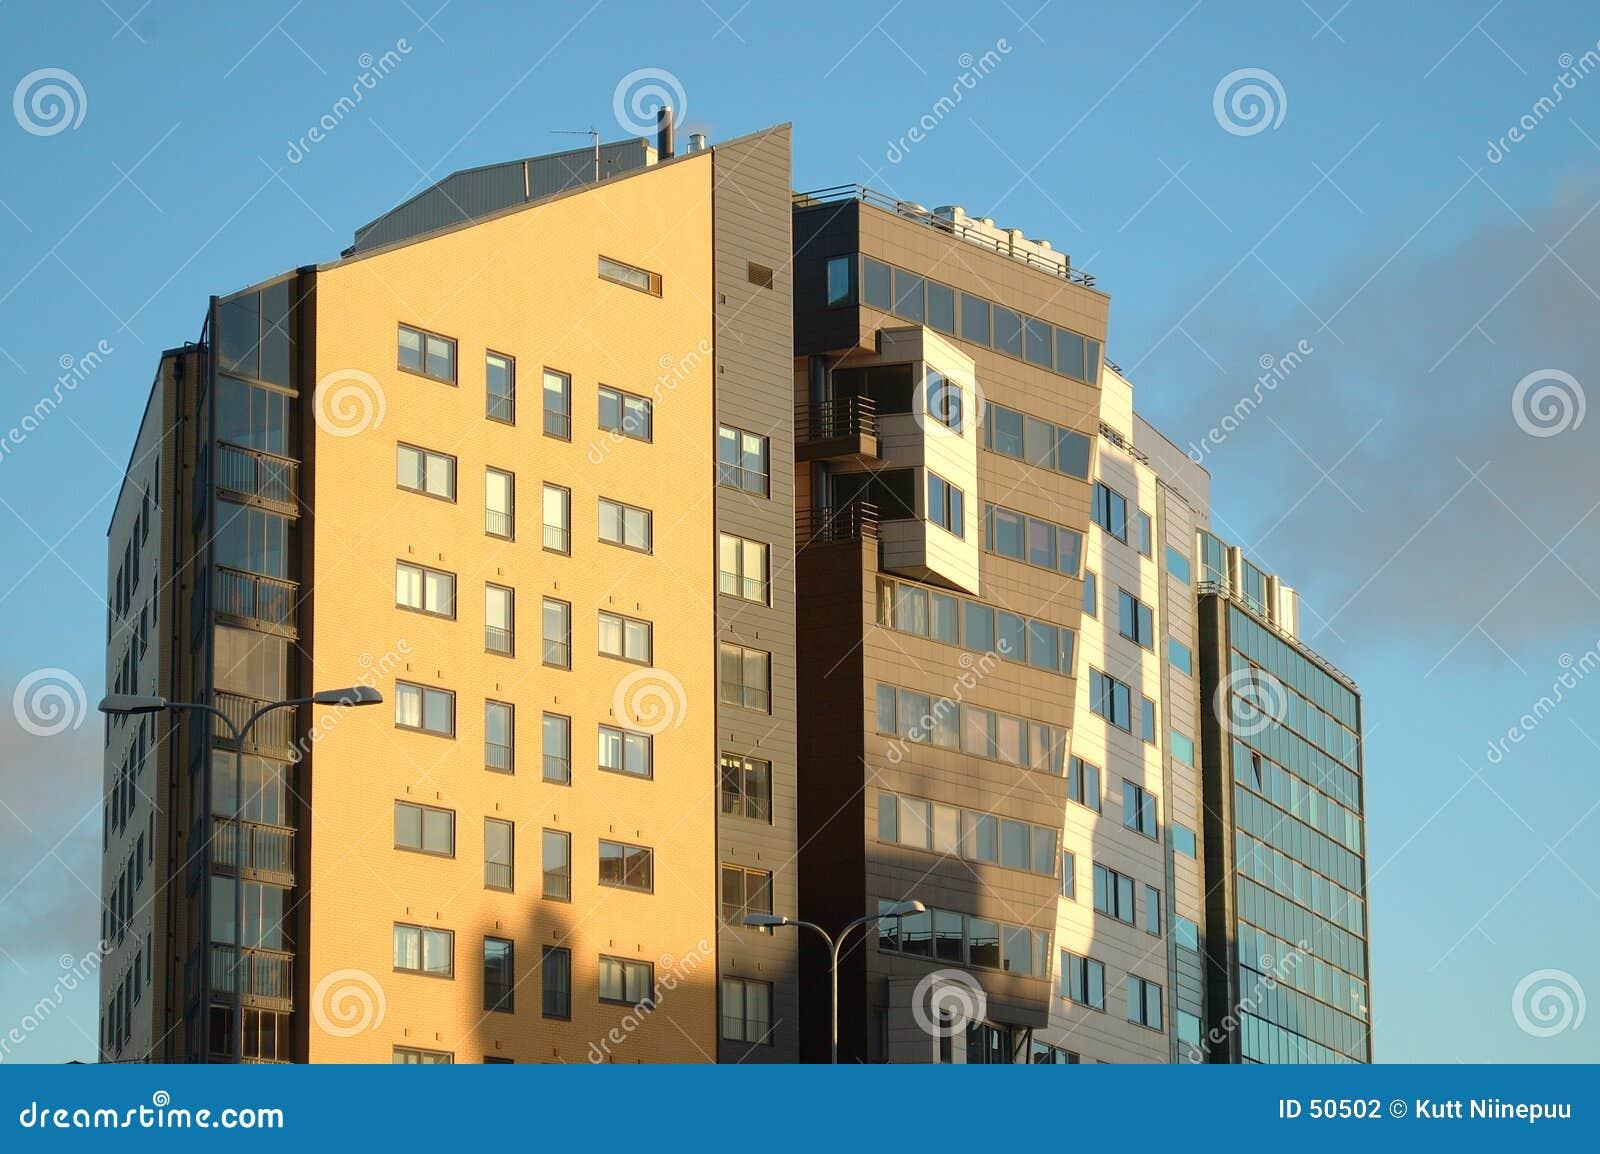 Download αρχιτεκτονικό θαύμα στοκ εικόνες. εικόνα από χωρισμένος - 50502